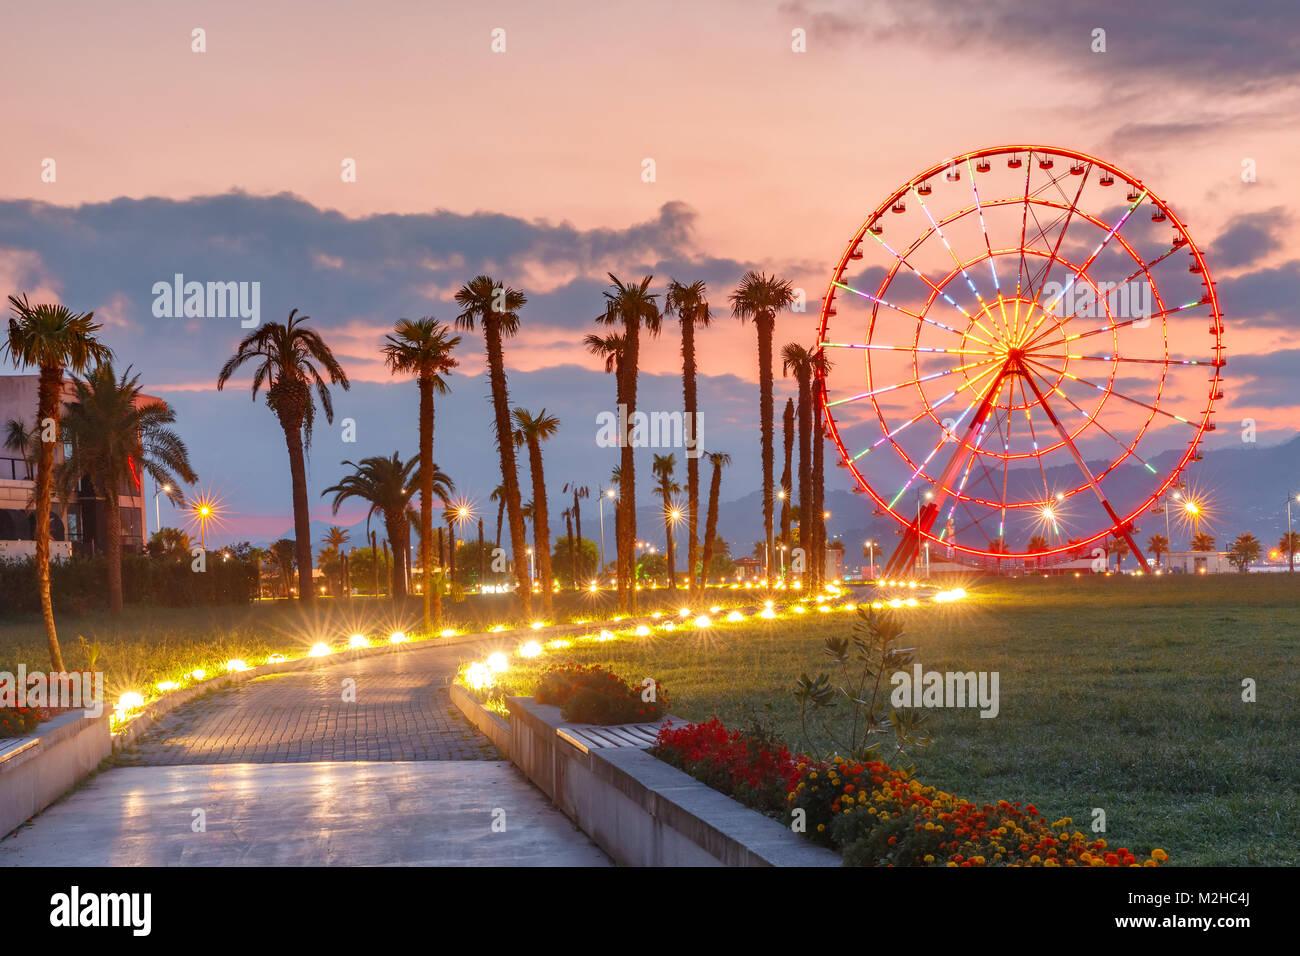 Ferris wheel on Batumi Seafront Promenade, Georgia - Stock Image